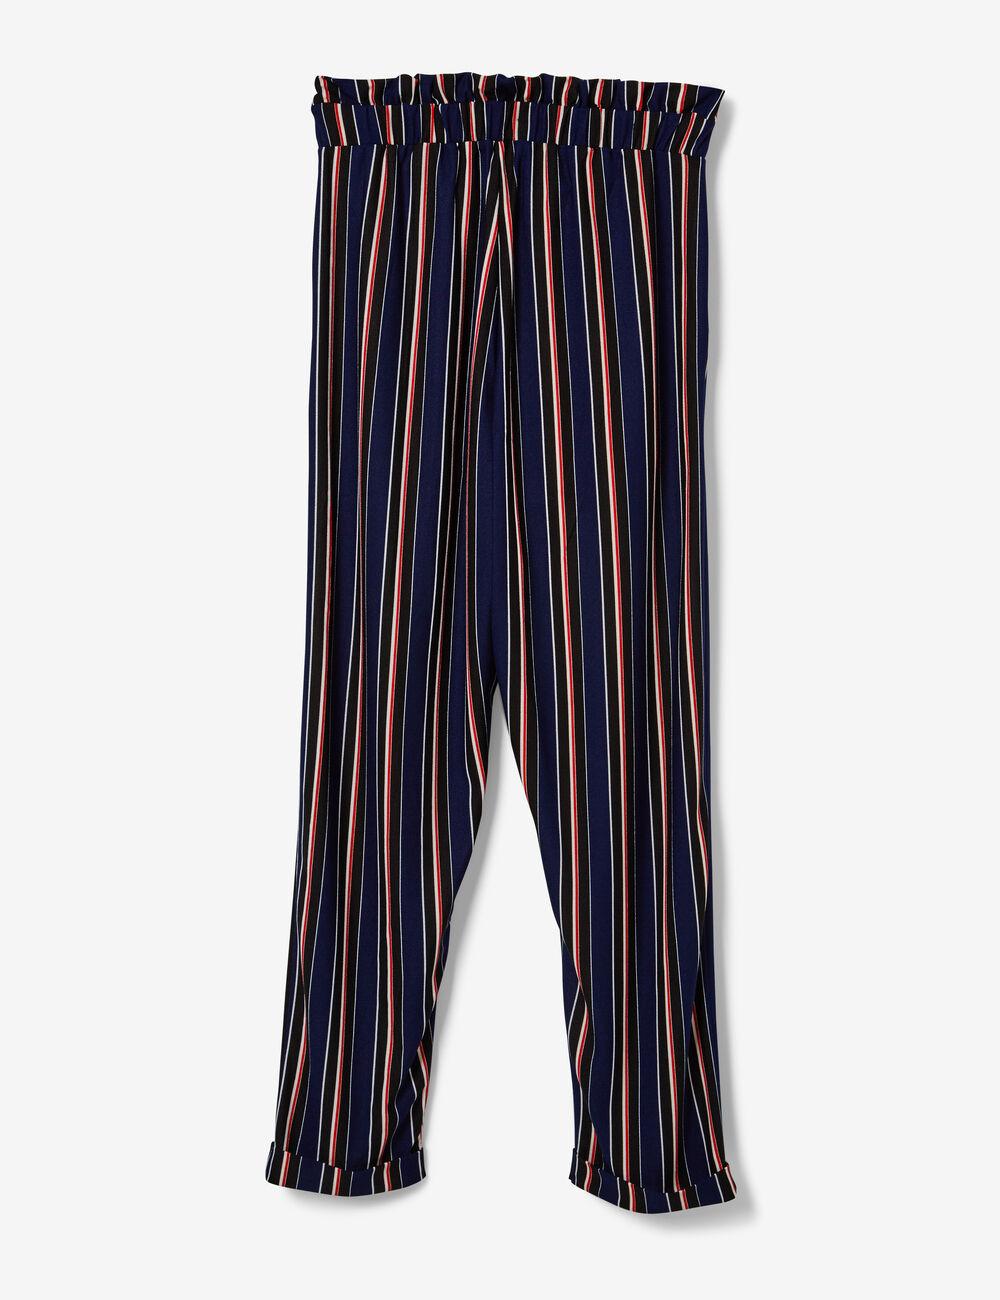 244fa5ee9600 Pantalon fluide rayé noir, blanc, rouge et bleu marine femme • Jennyfer